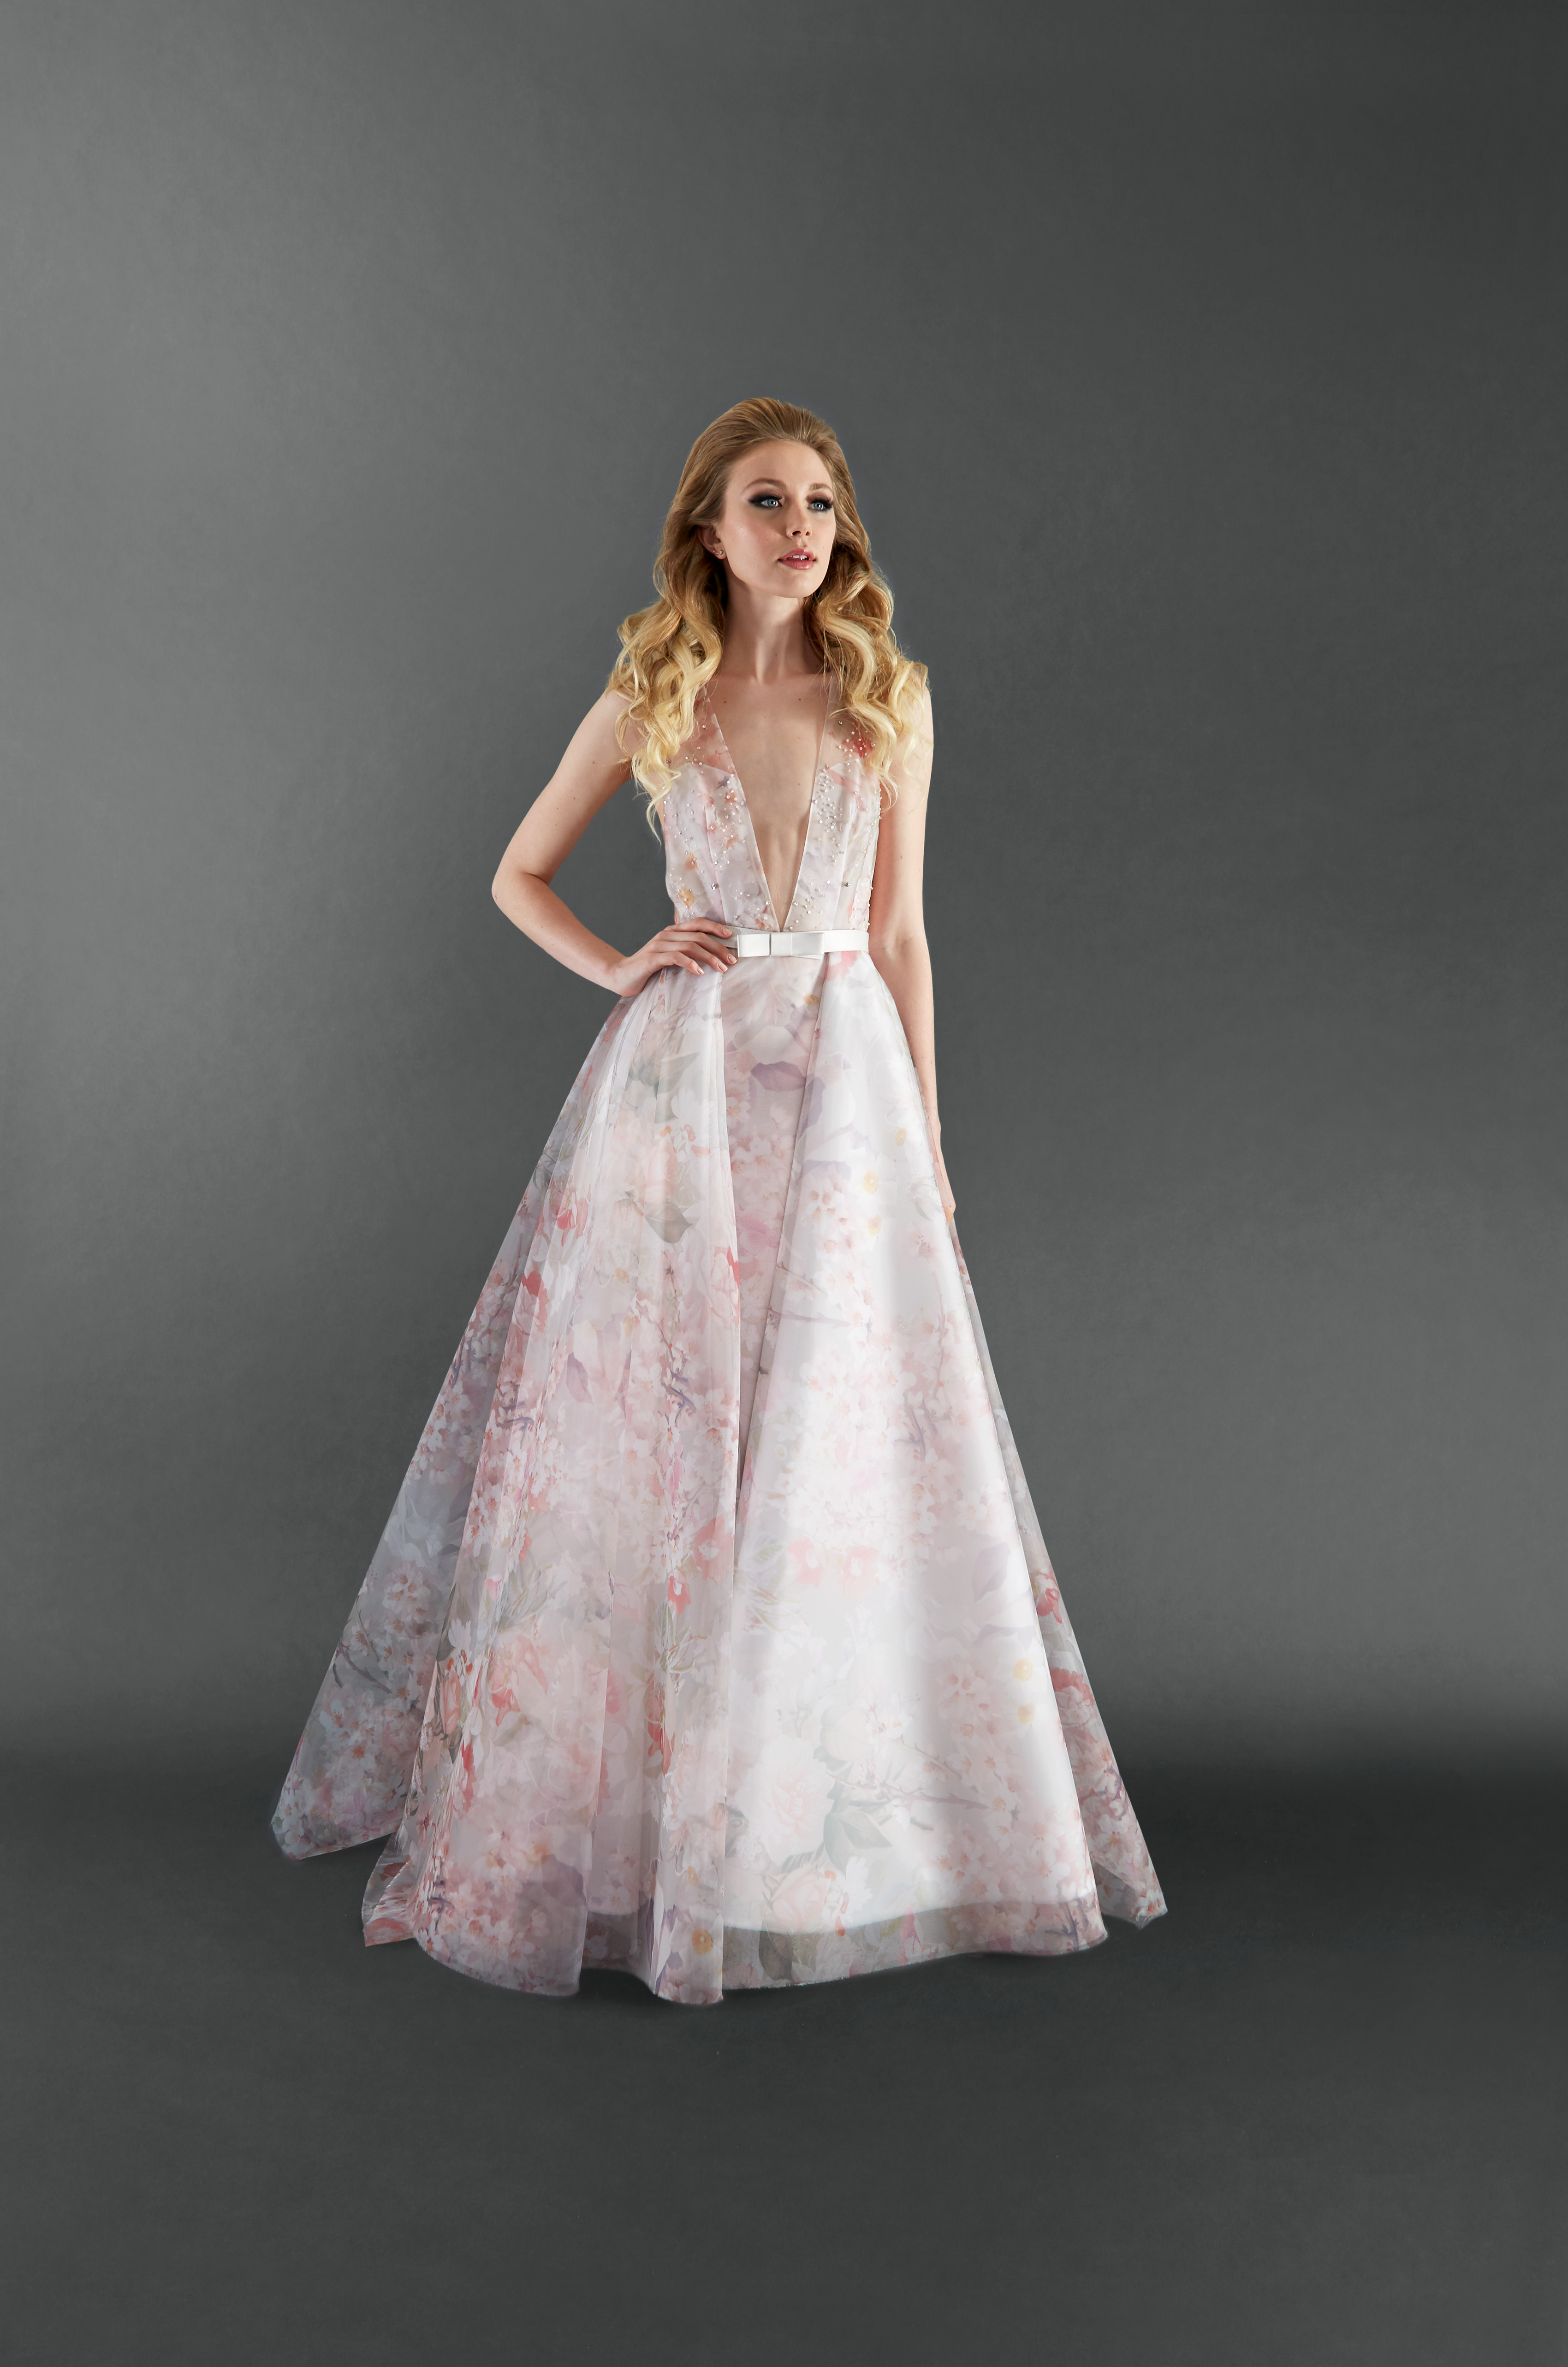 randi rahm v-neck pink floral wedding dress spring 2018